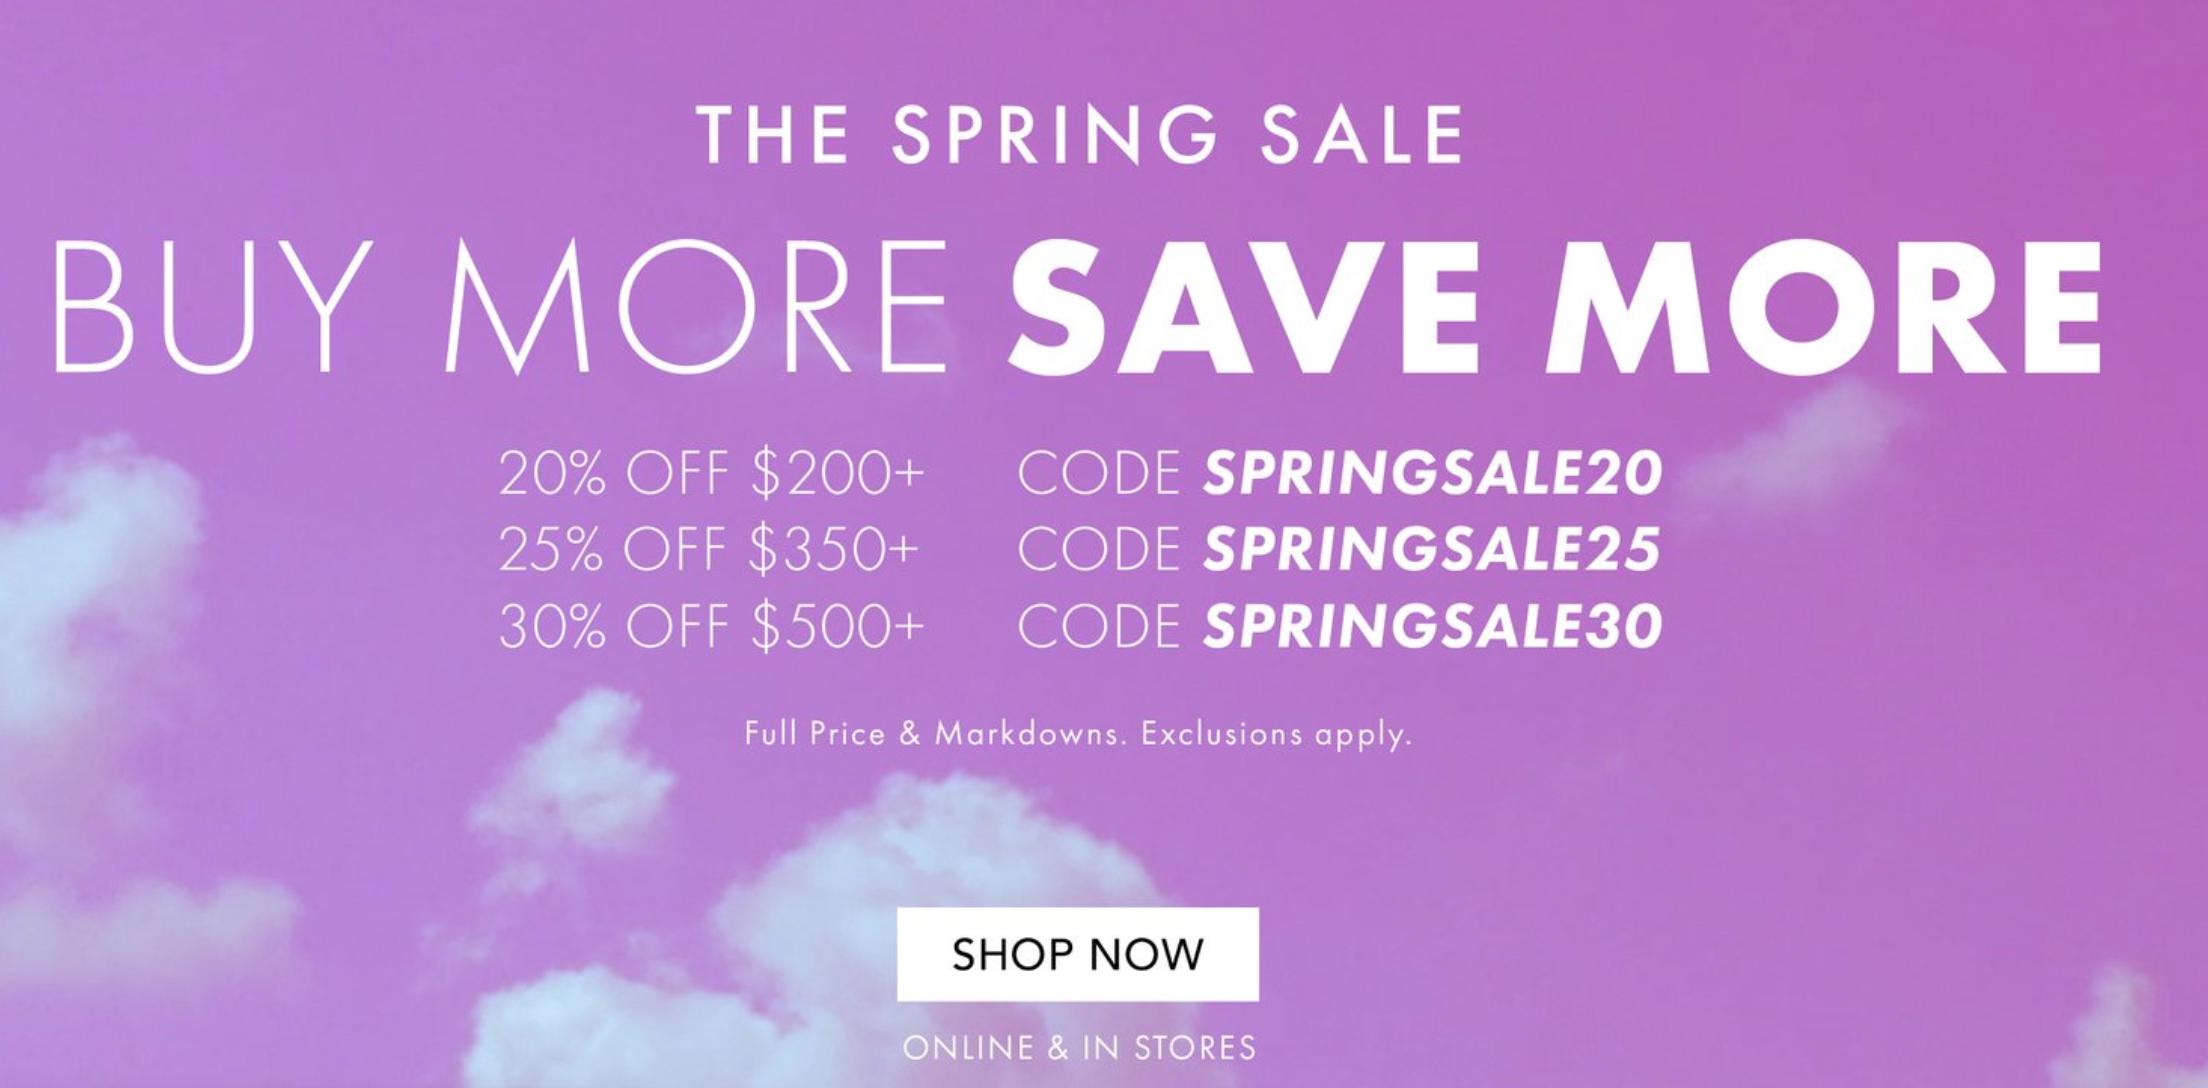 Best of rebecca minkoff spring sale 2019